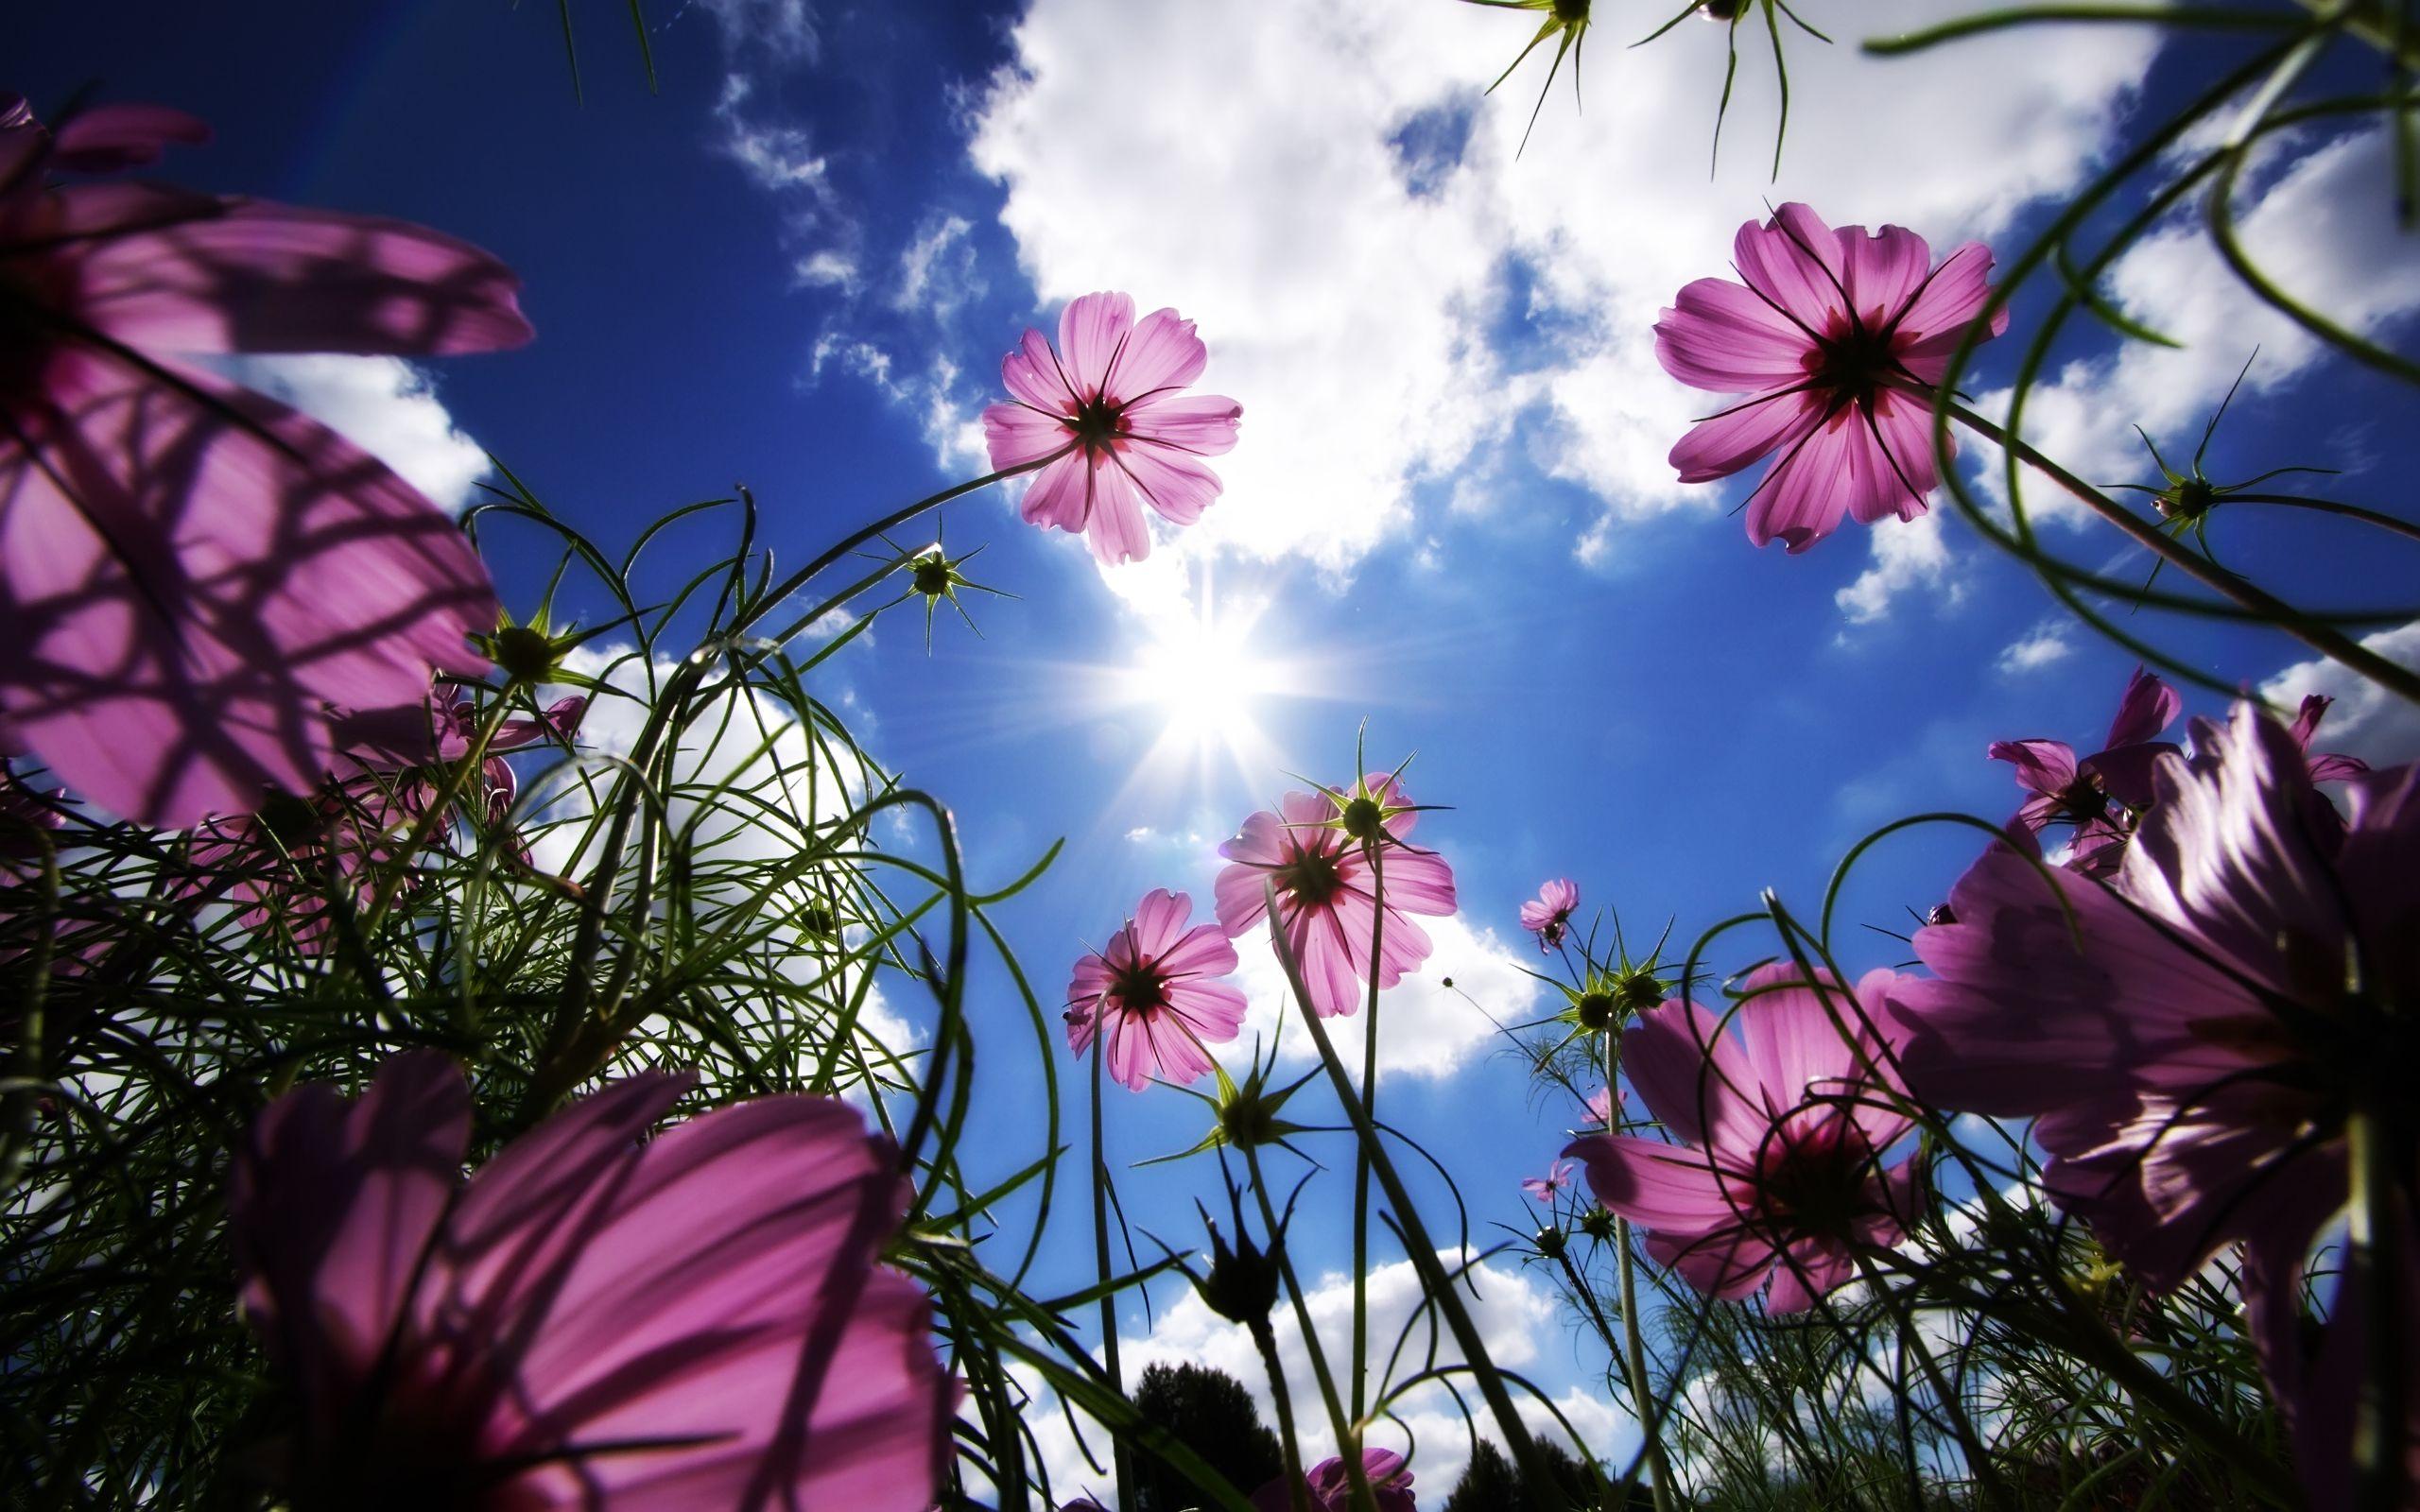 Spring Desktop Wallpapers   Top Spring Desktop Backgrounds 2560x1600